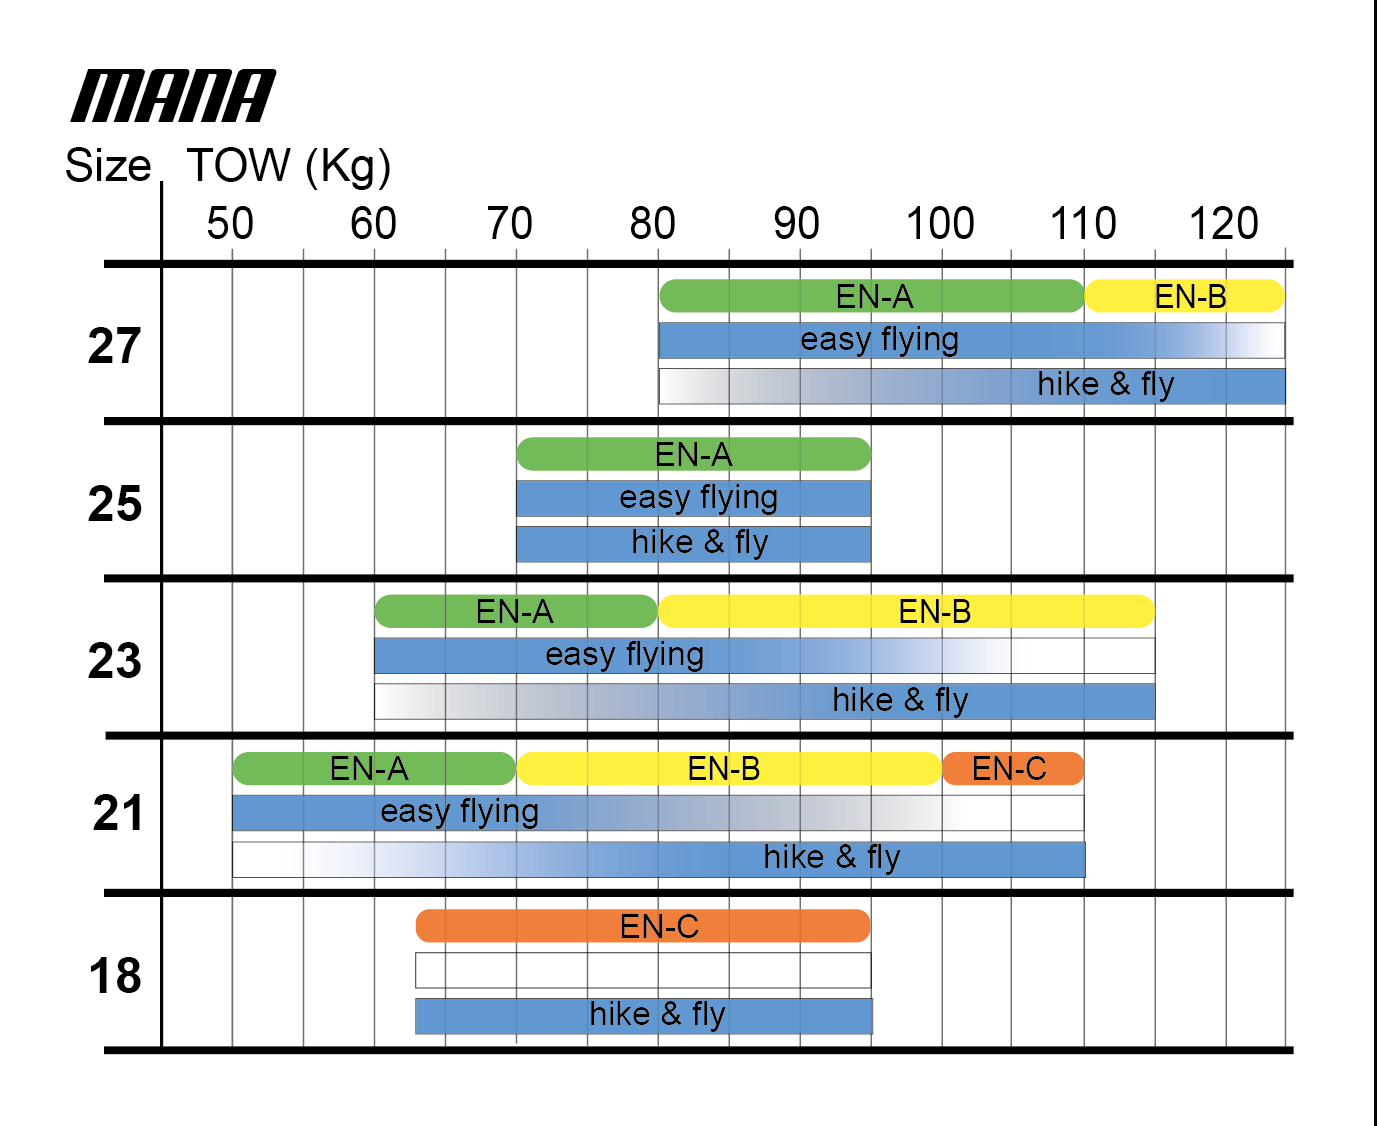 Mana chart 01